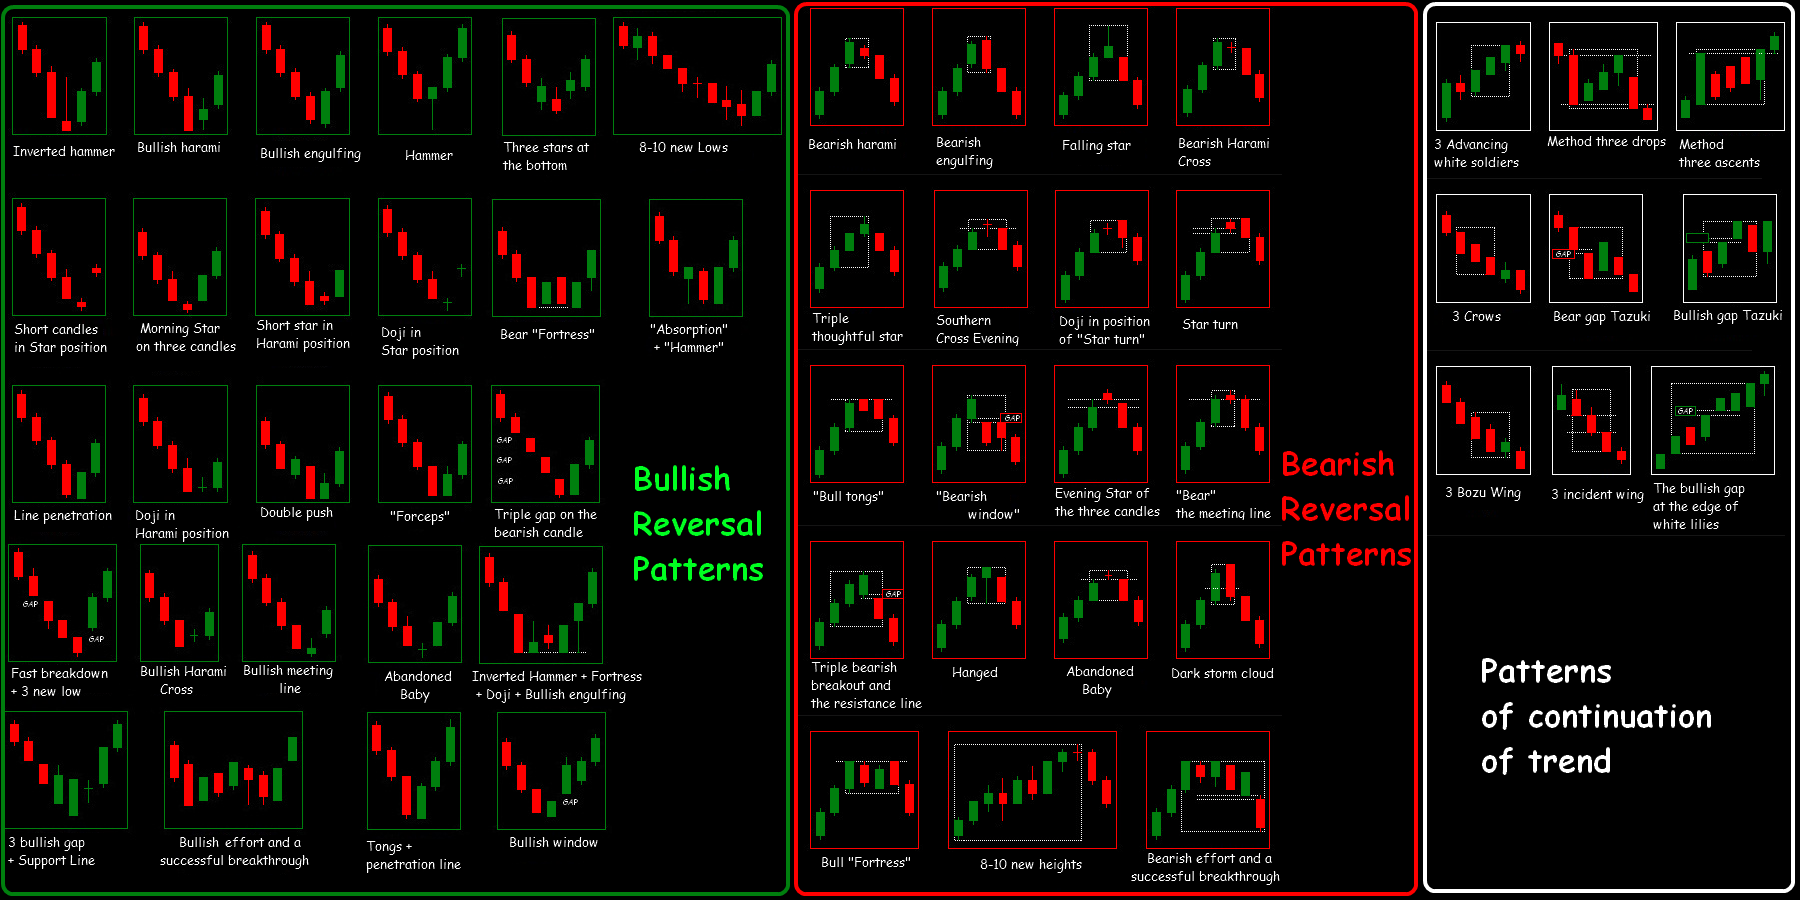 bináris bnomo befektetési opciók